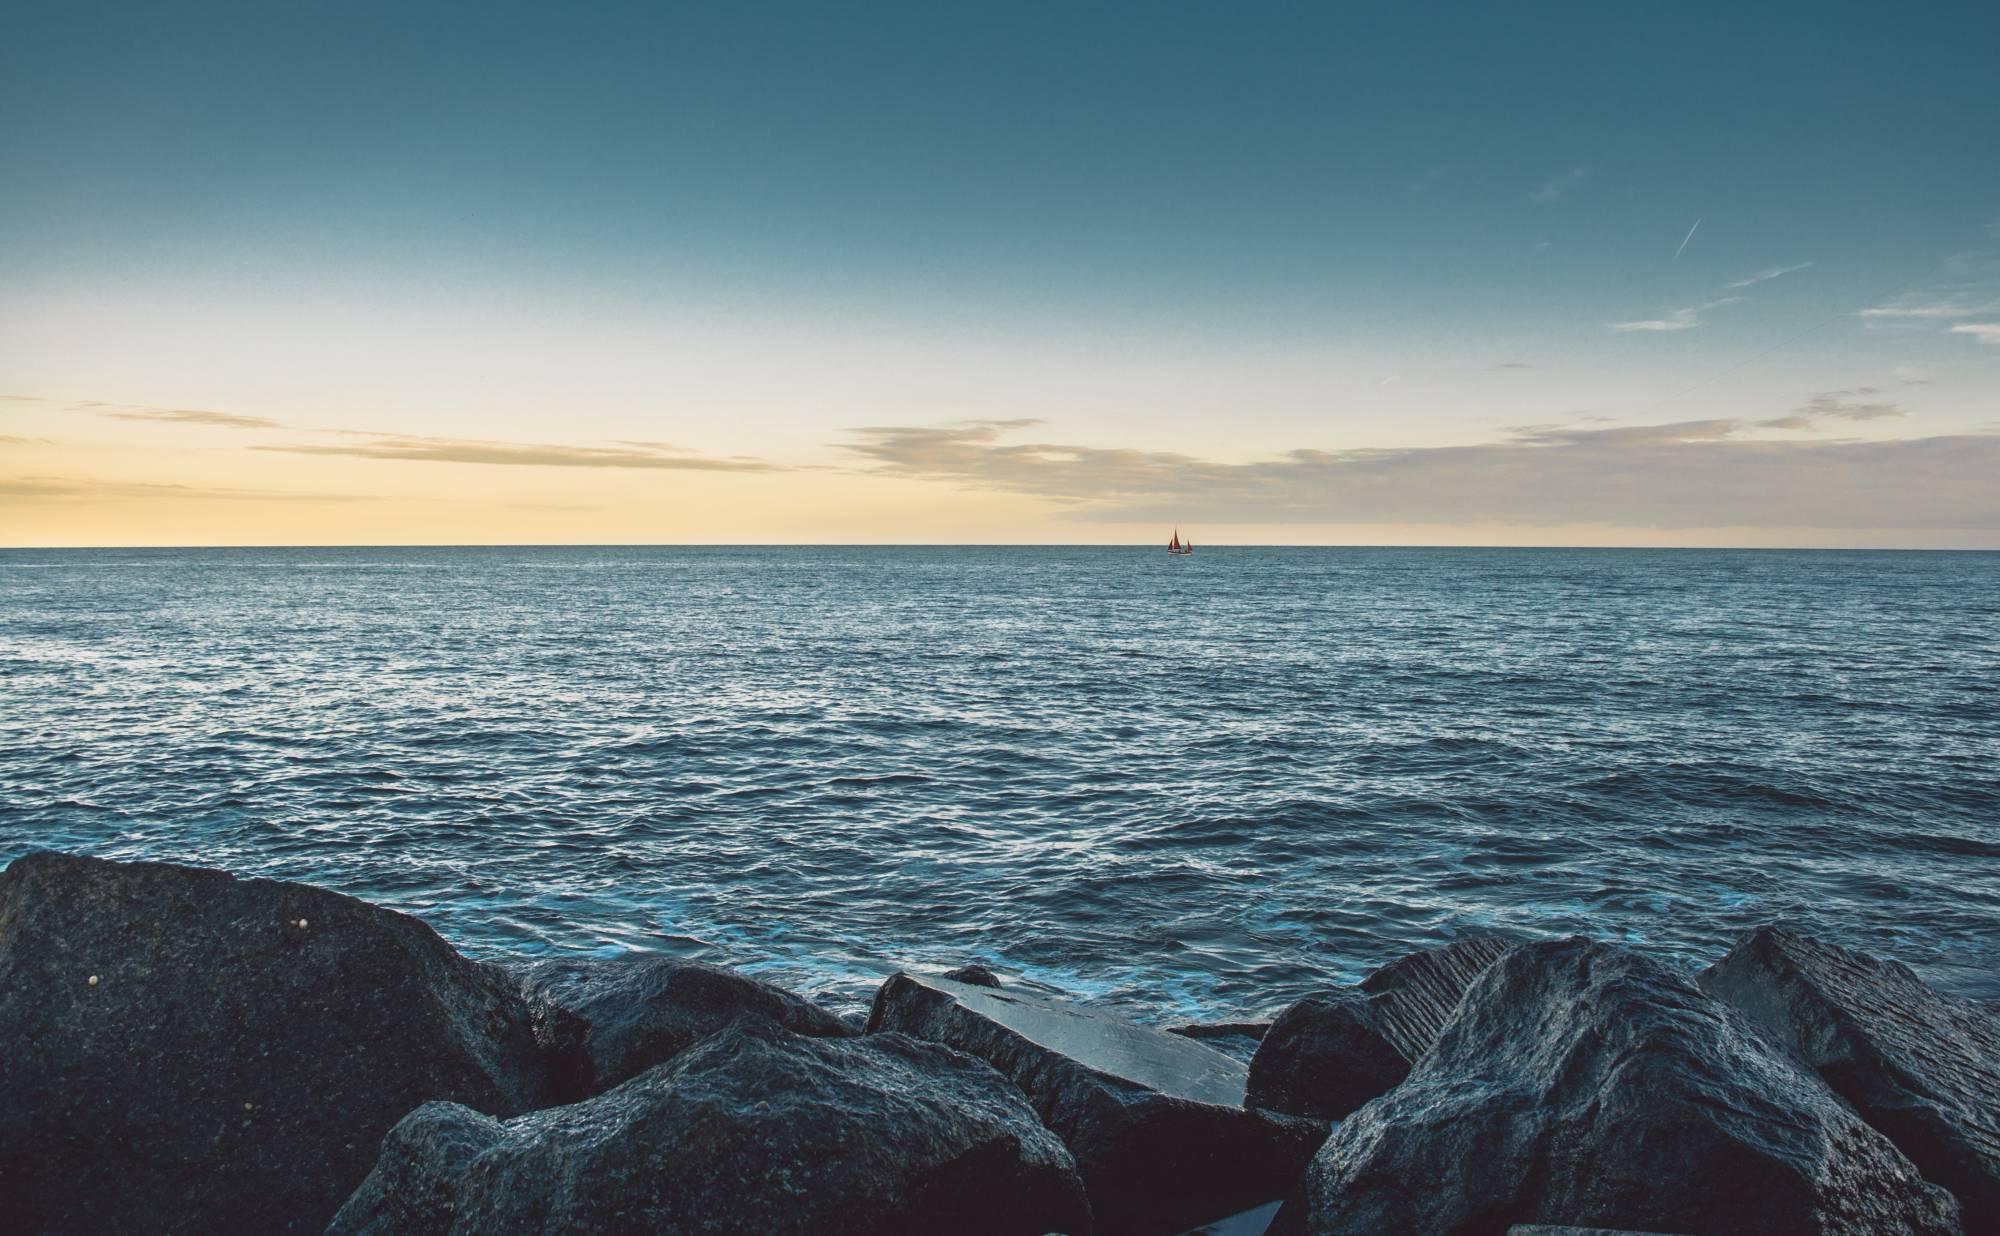 Lyme Regis, England